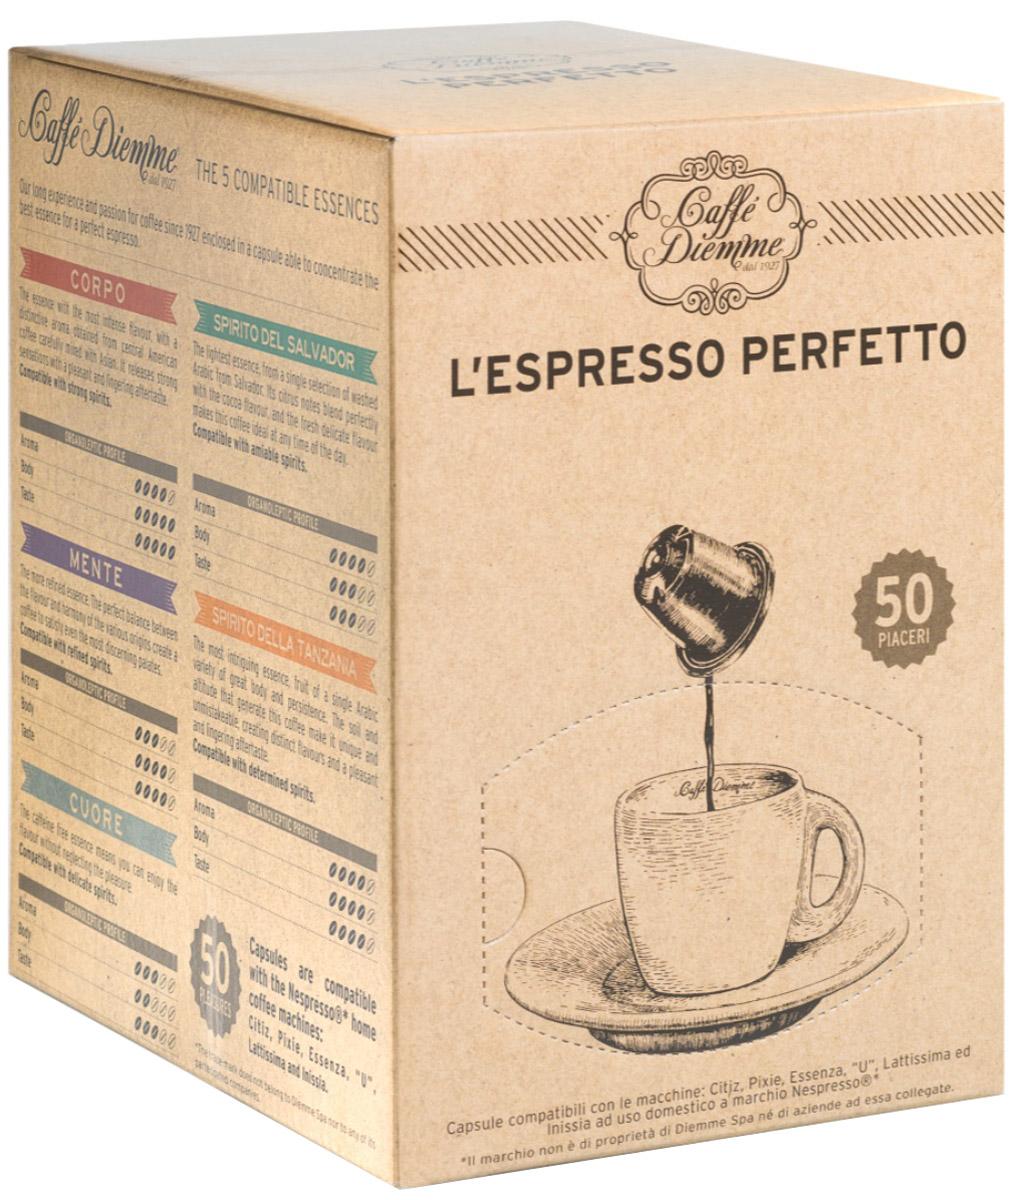 Diemme Caffe Spirito del Salvador кофе в капсулах, 50 шт кофе в капсулах caffe crema vollmundig tchibo